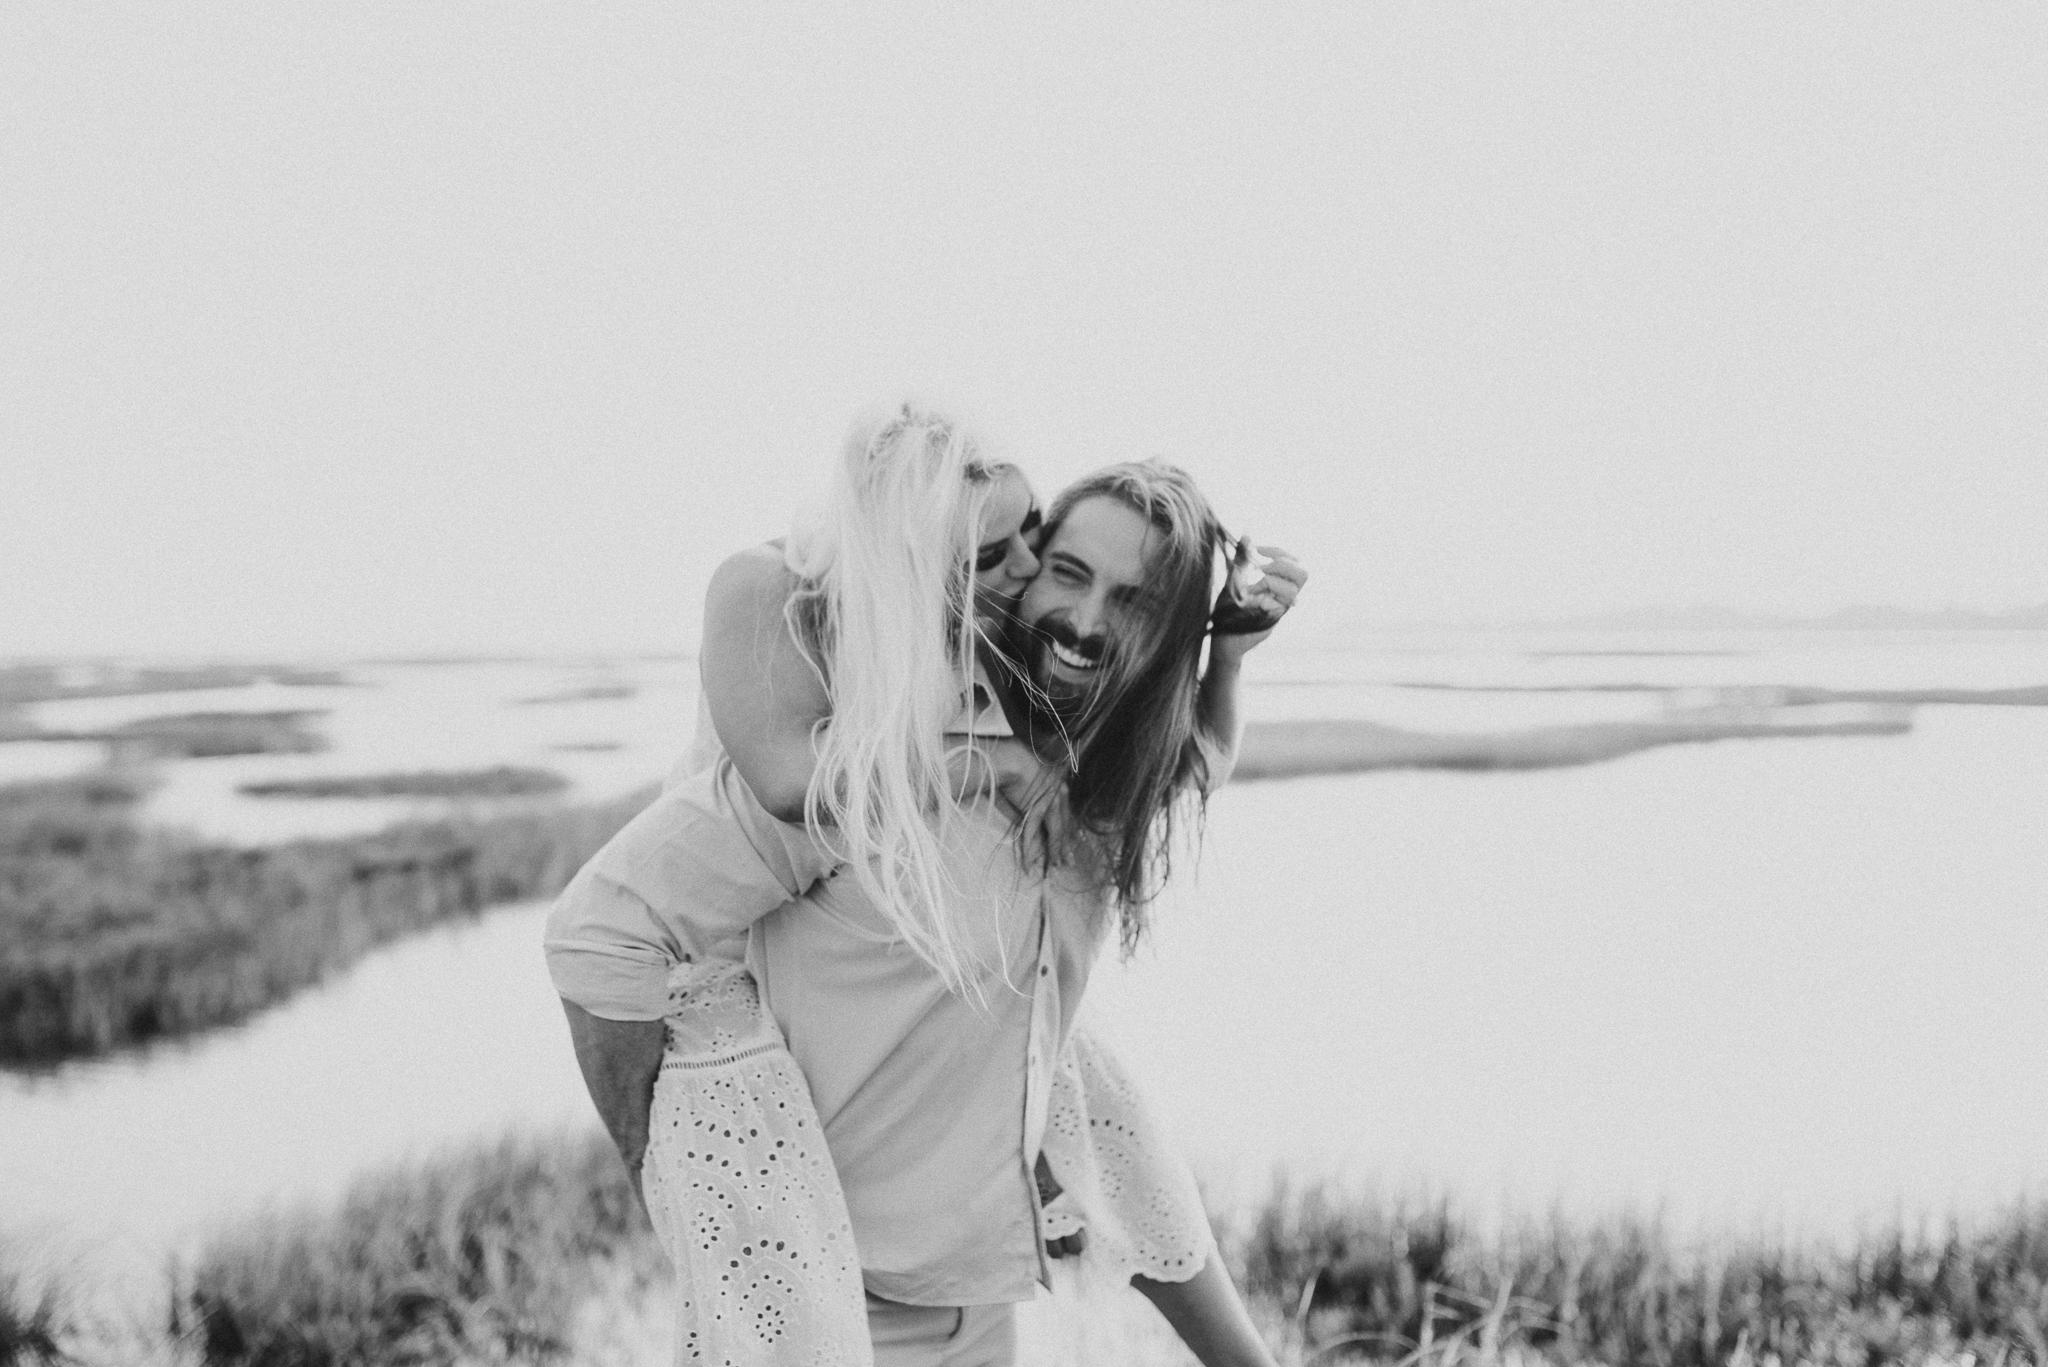 Ashley + Charles - Galveston Texas Moody Engagement Session | Kristen Giles Photography - 012.jpg